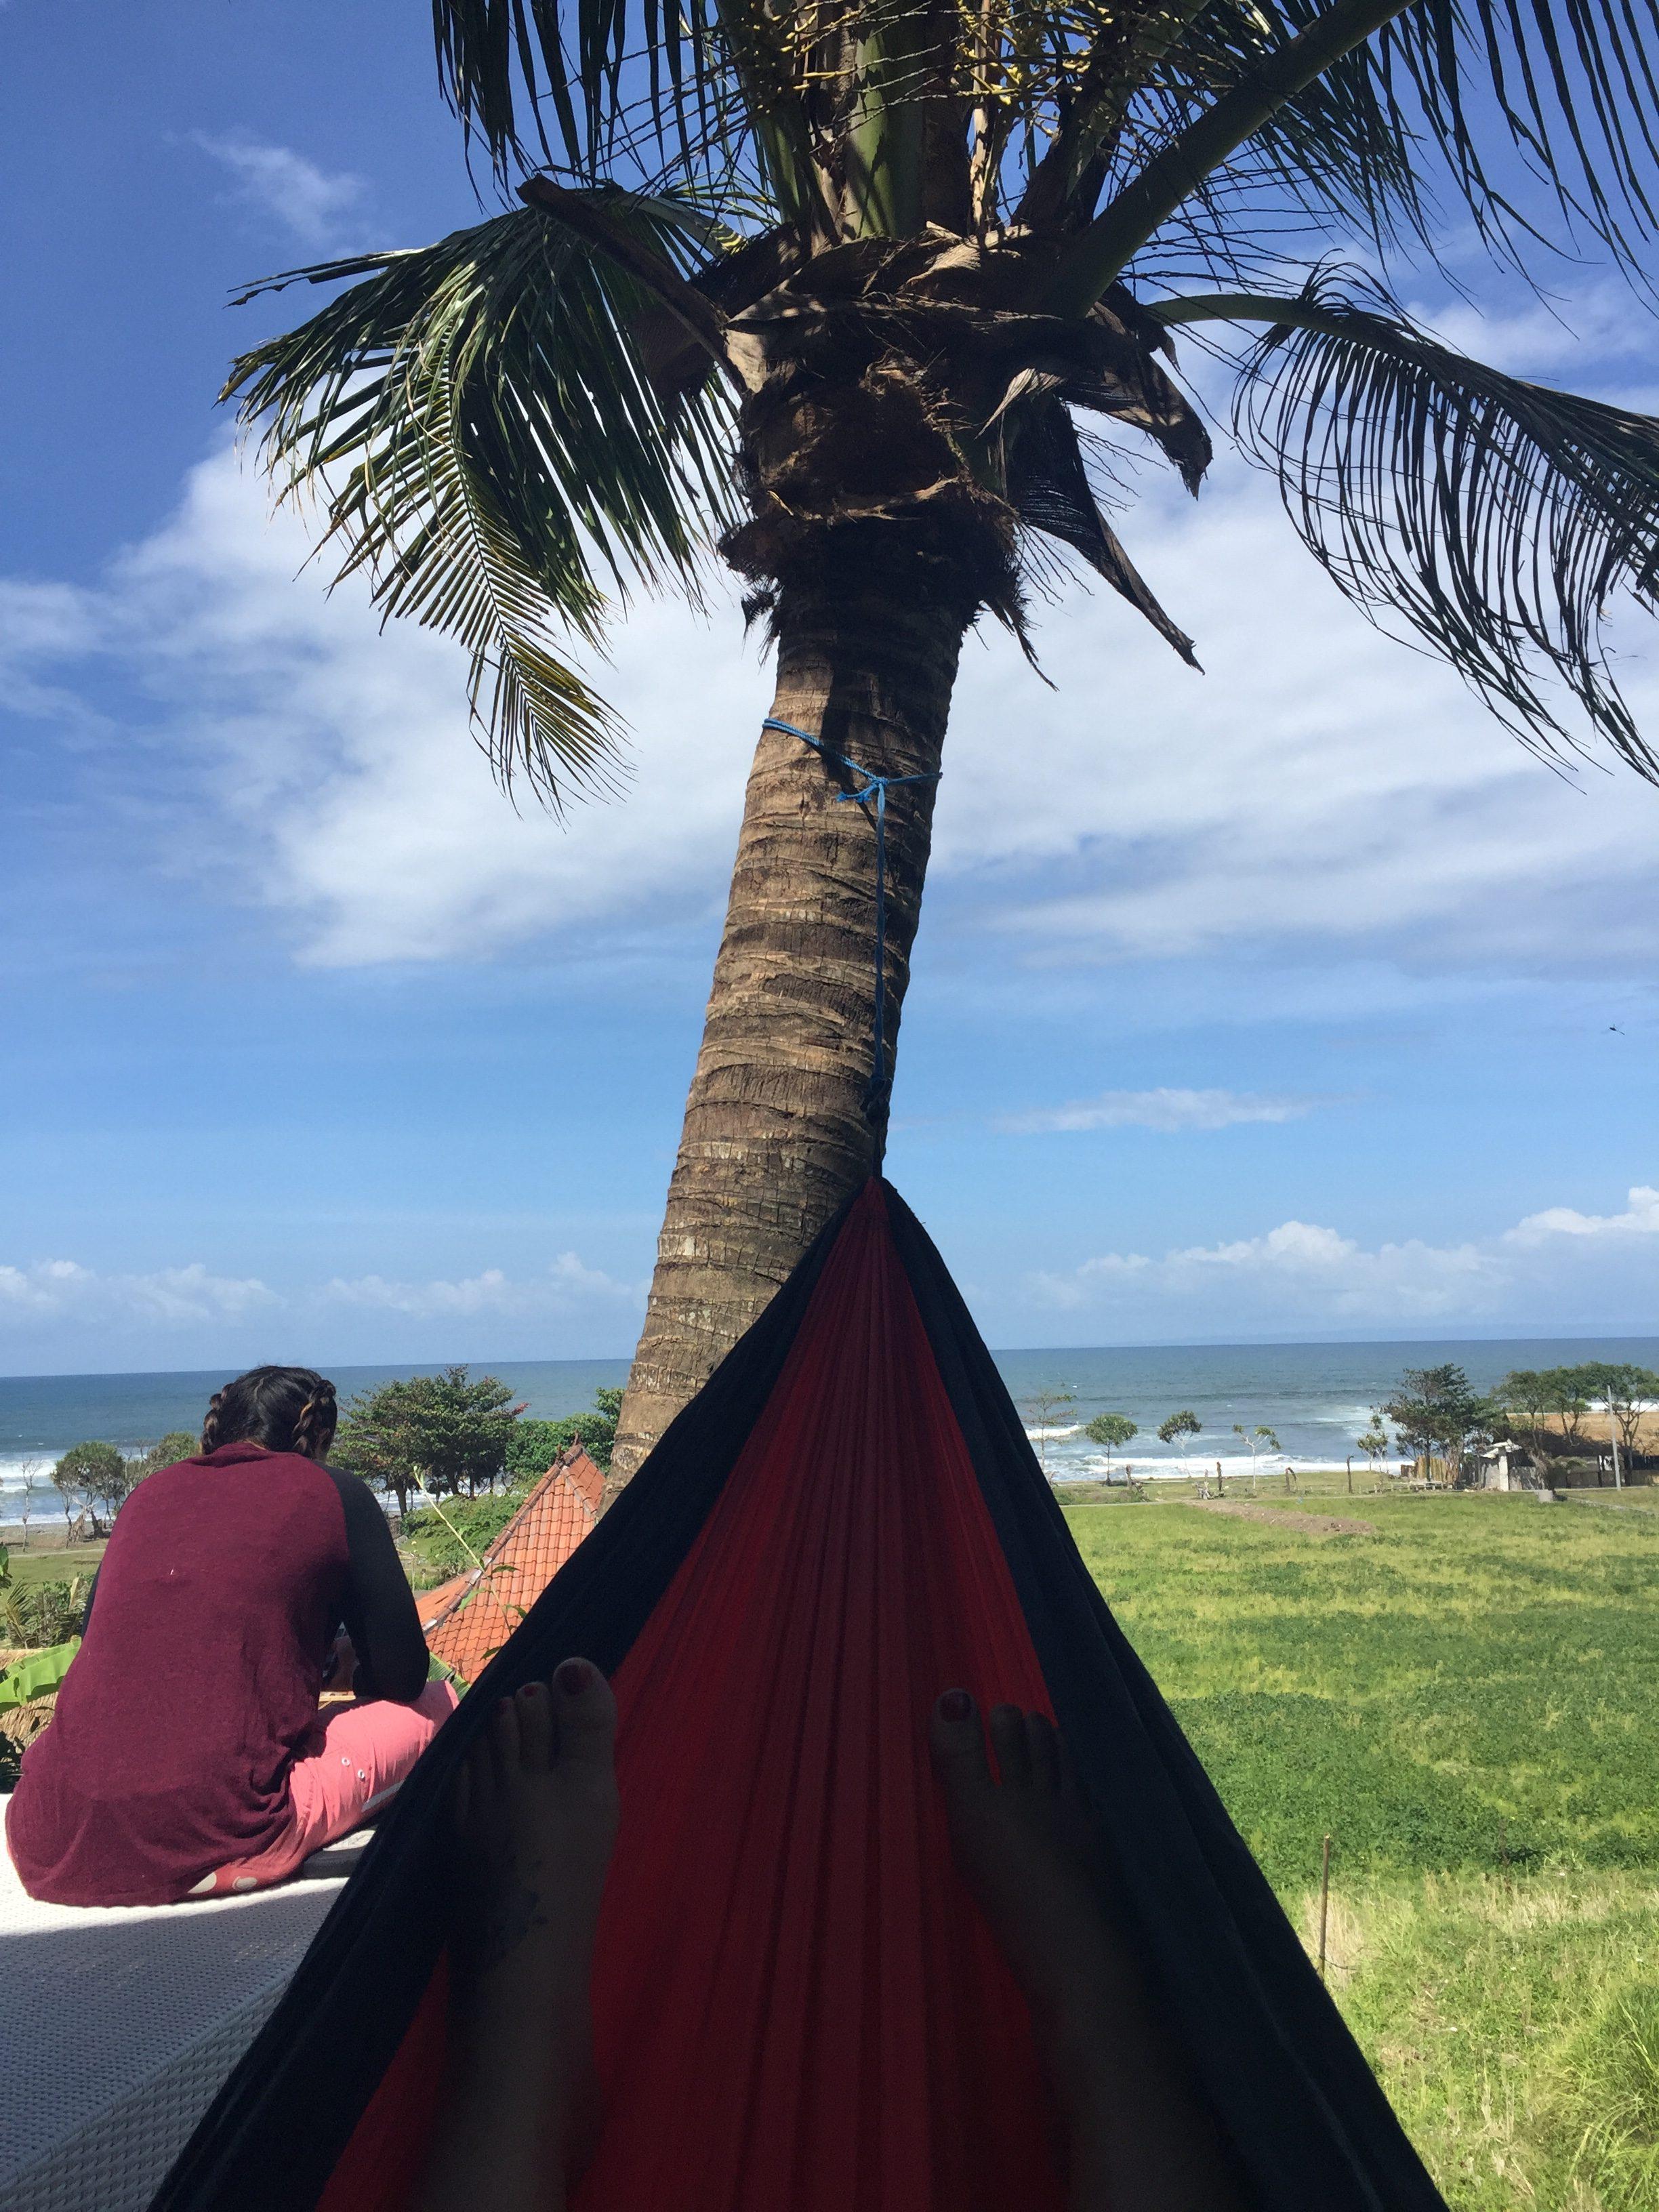 Chilling in the hammock